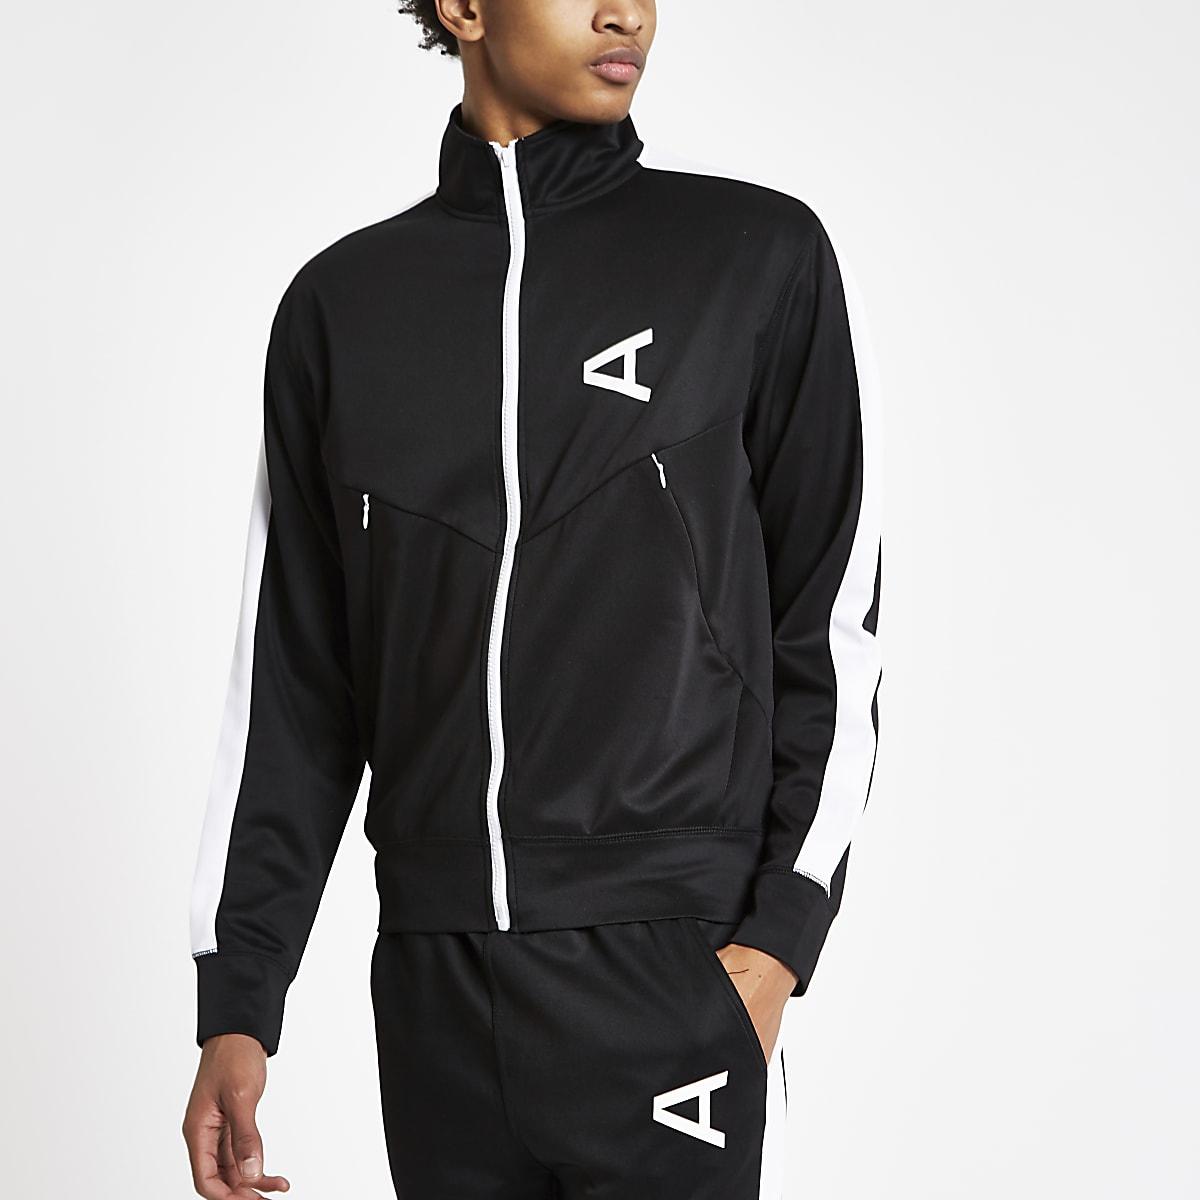 Arcminute – Schwarze Trainingsjacke mit Tunnelkragen